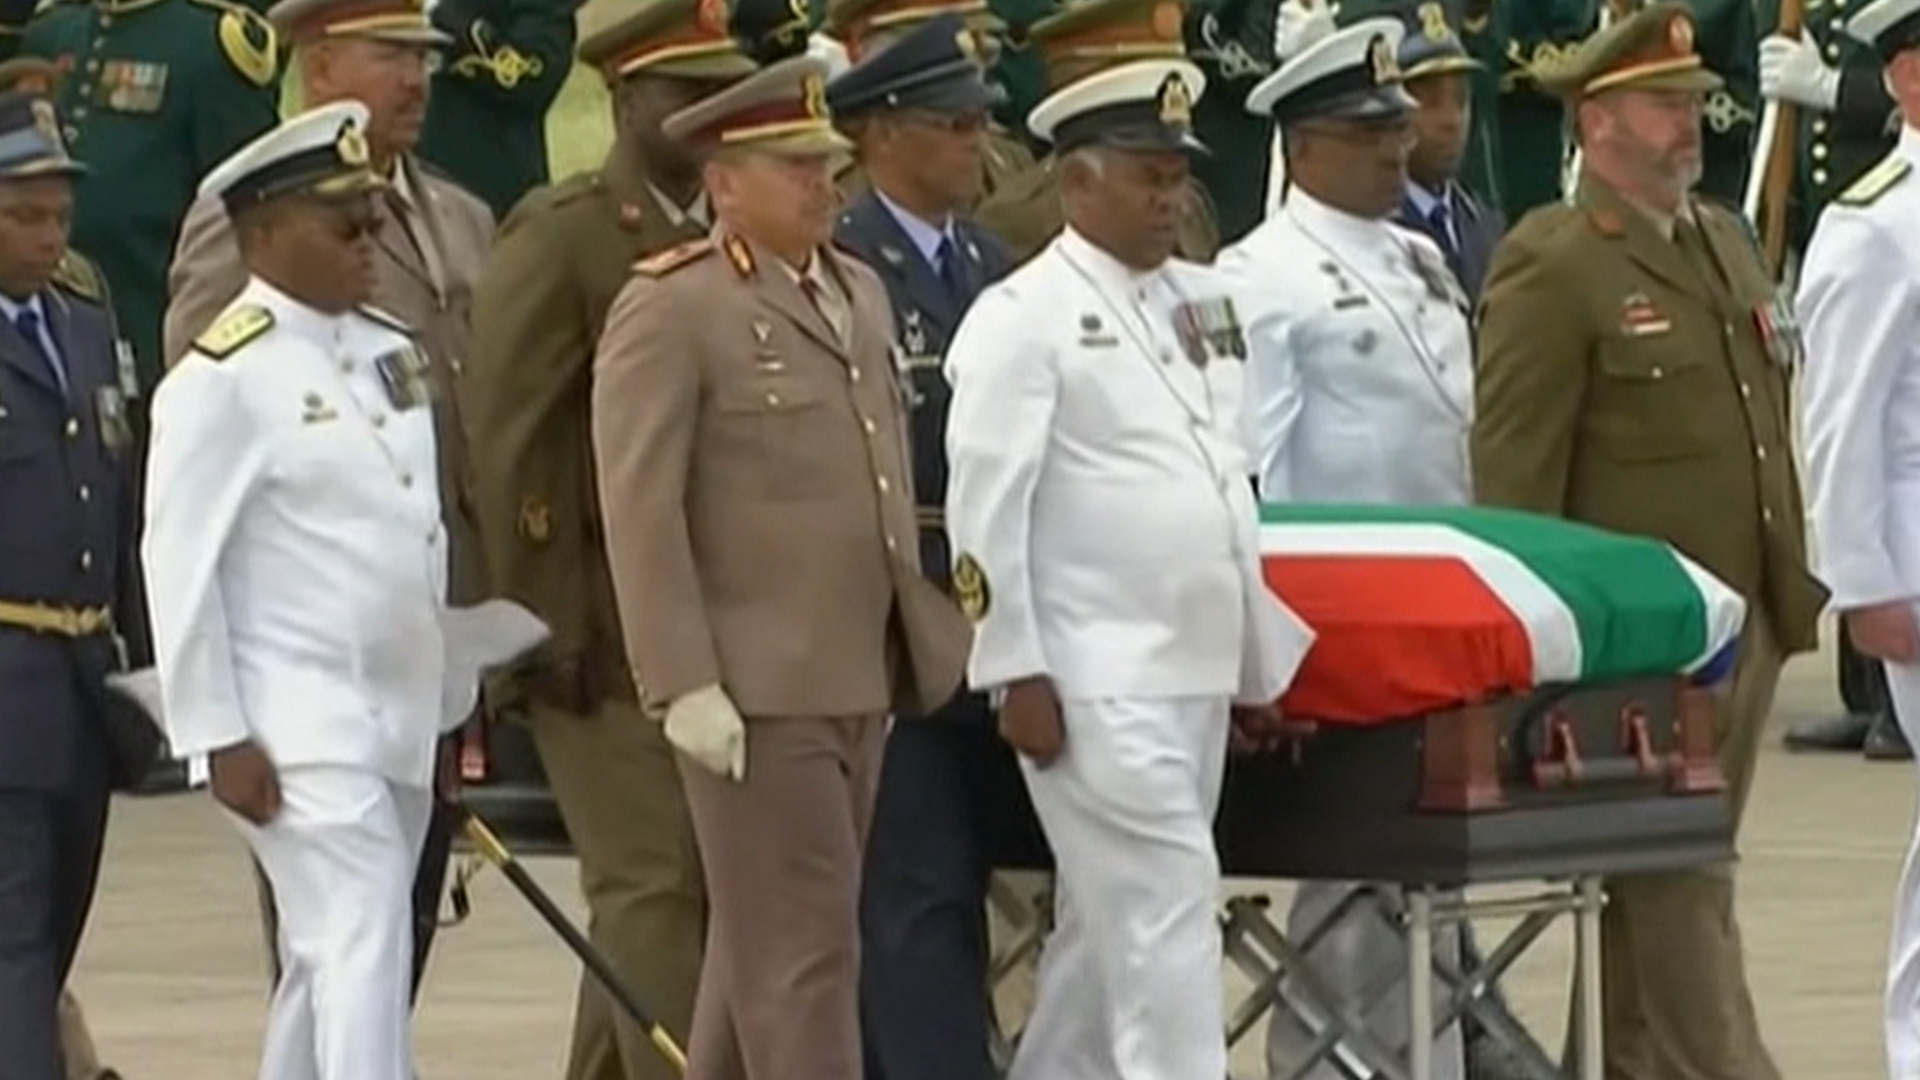 Desmond Tutu not attending Mandela's funeral?